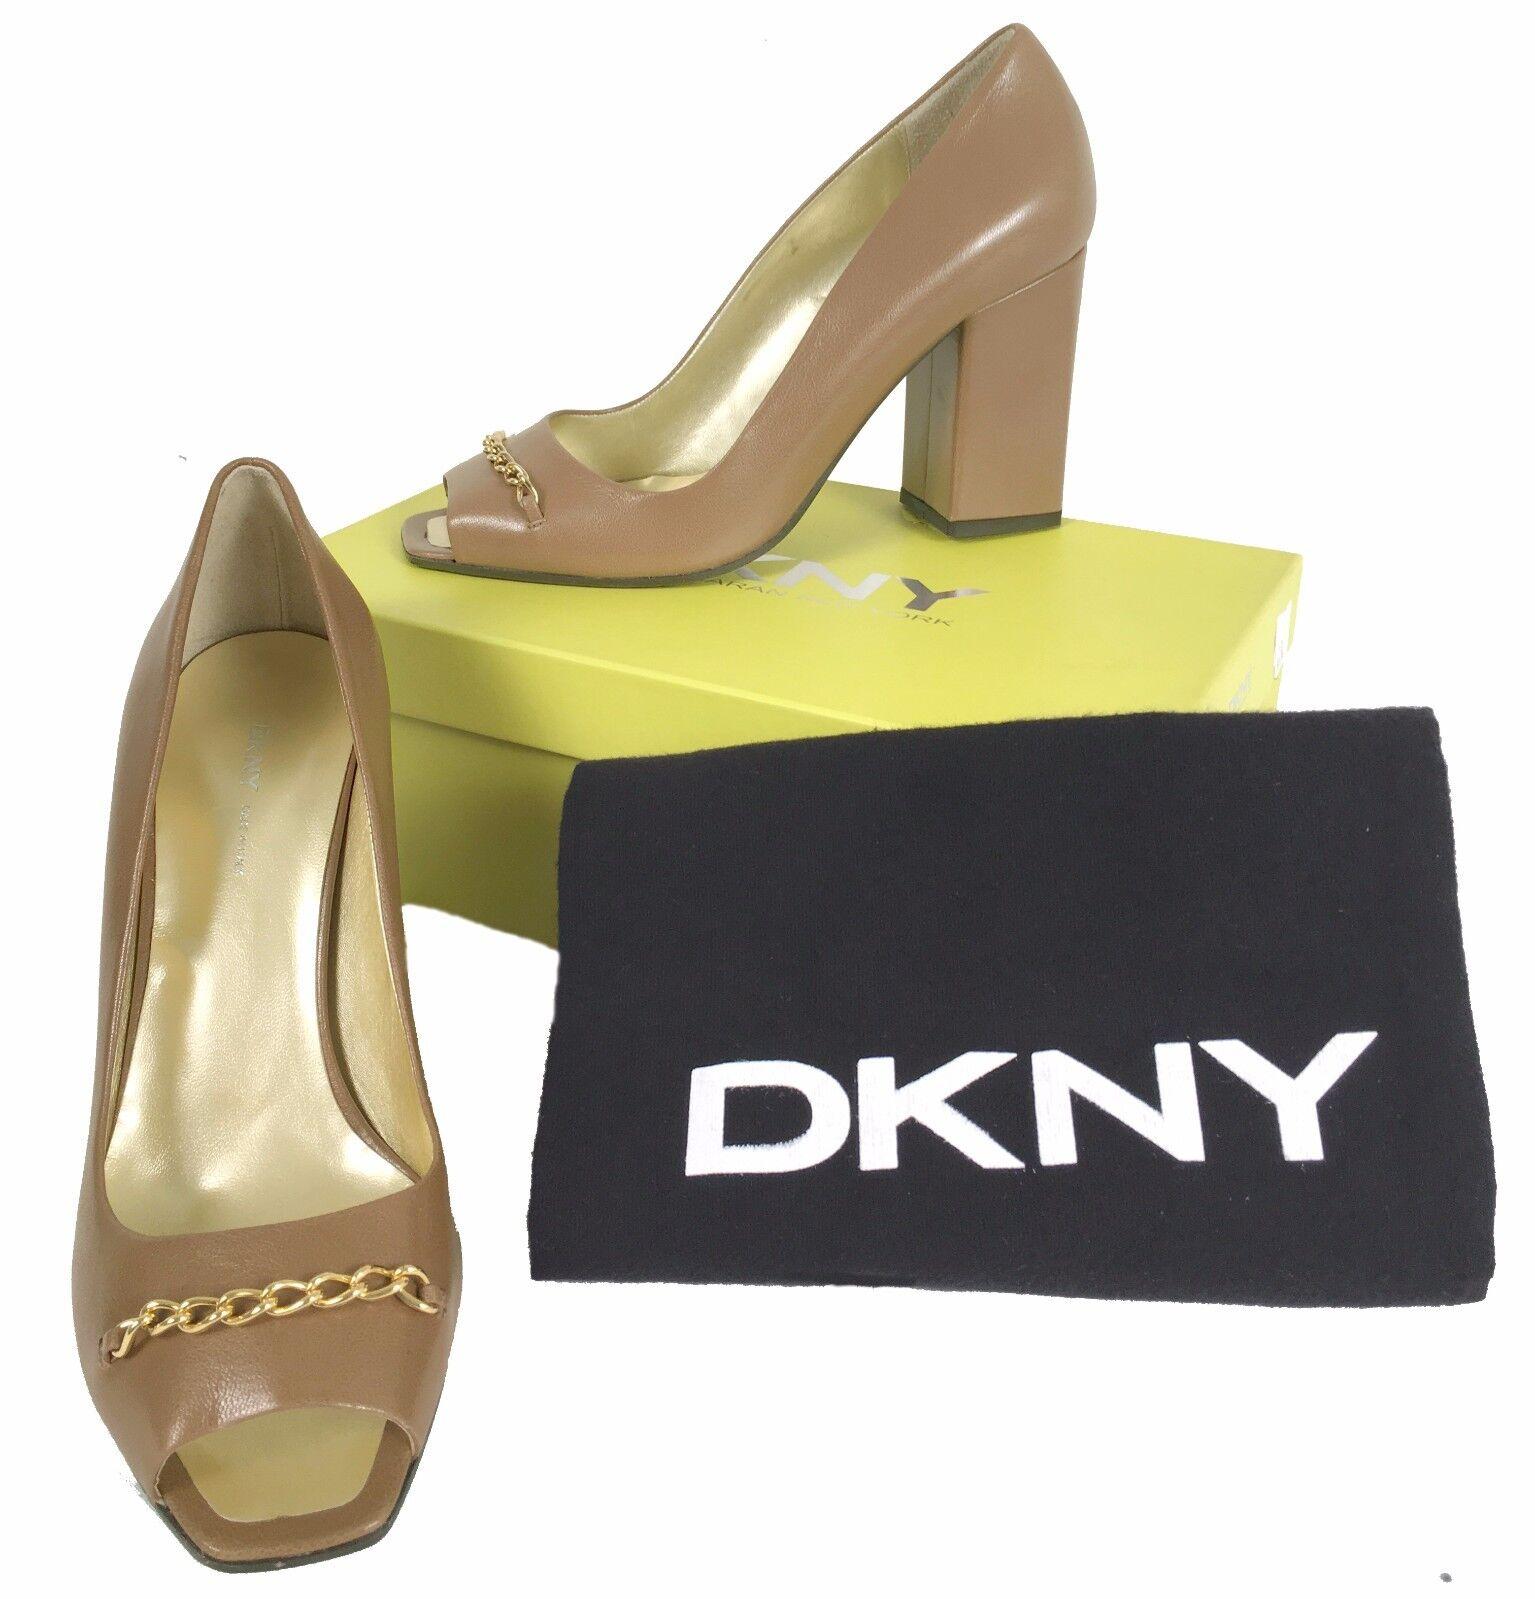 NEW  245 damen Karan DKNY schuhe (Pumps Heels) 8 Tan  Gold Chain